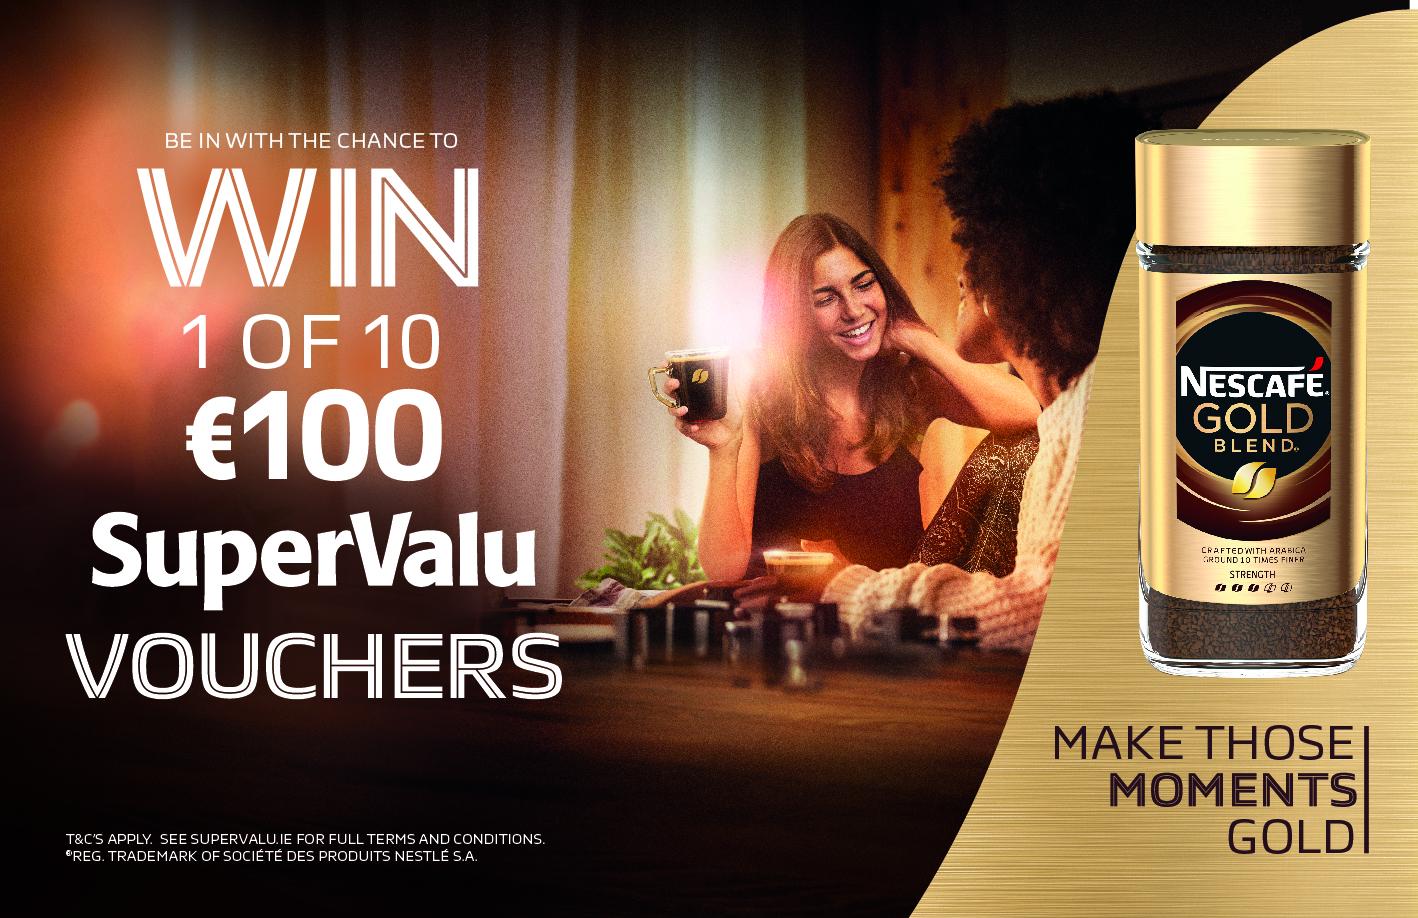 Win 1 of 10 €100 SuperValu Vouchers with Nescafé Gold Blend